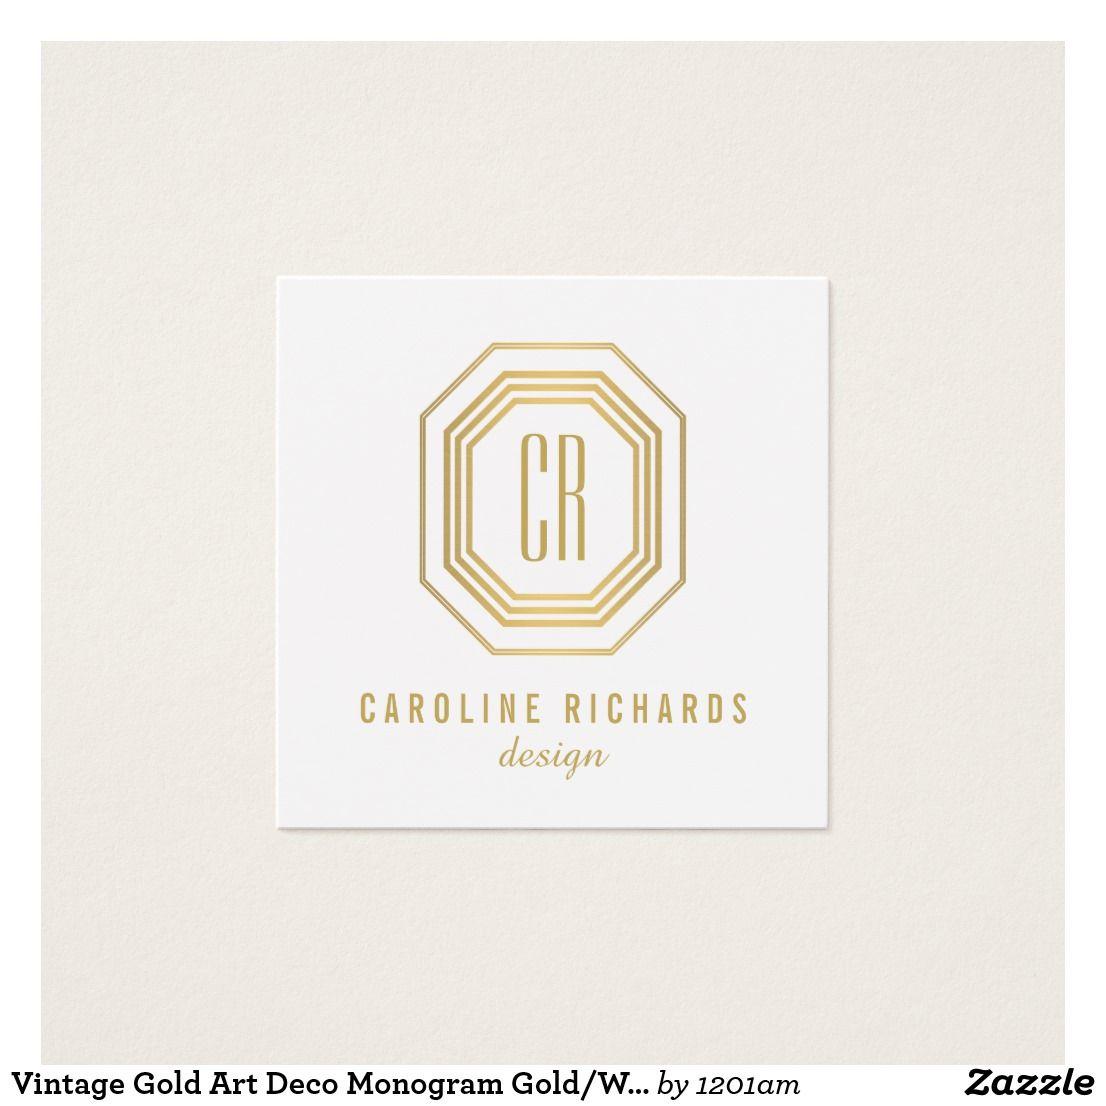 Vintage gold art deco monogram goldwhite square business card vintage gold art deco monogram goldwhite square business card reheart Gallery